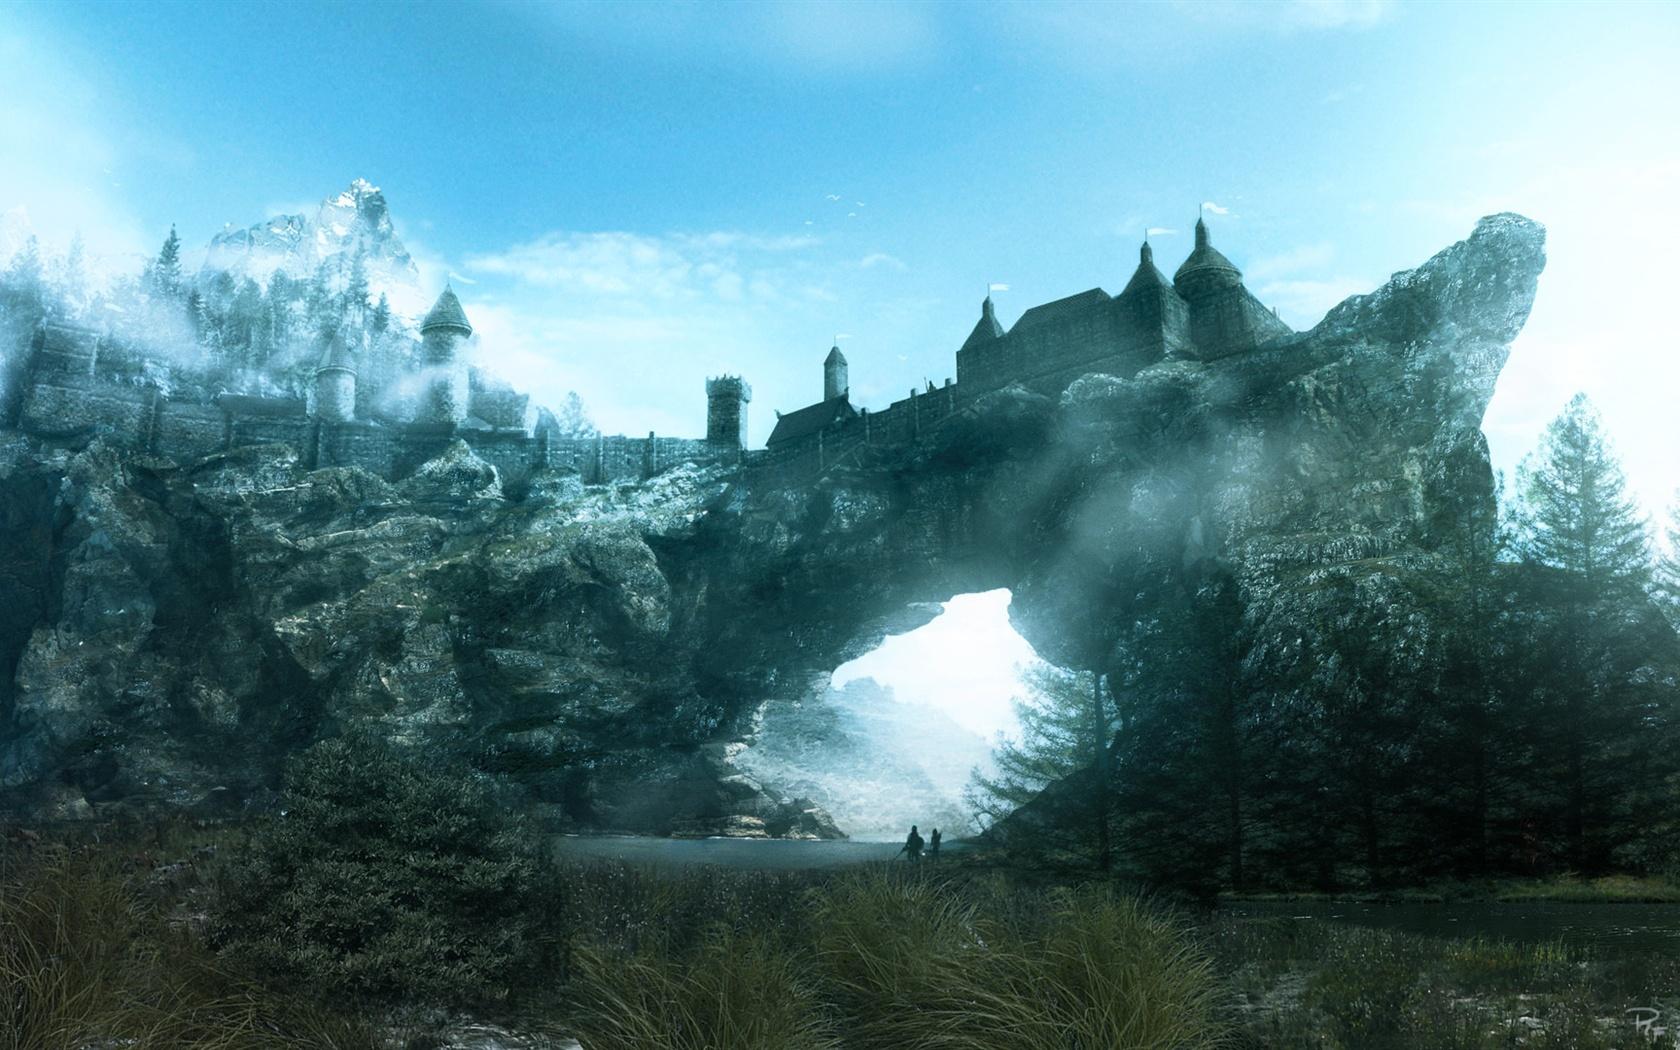 The-Elder-Scrolls-V-Skyrim-HD-game_1680x